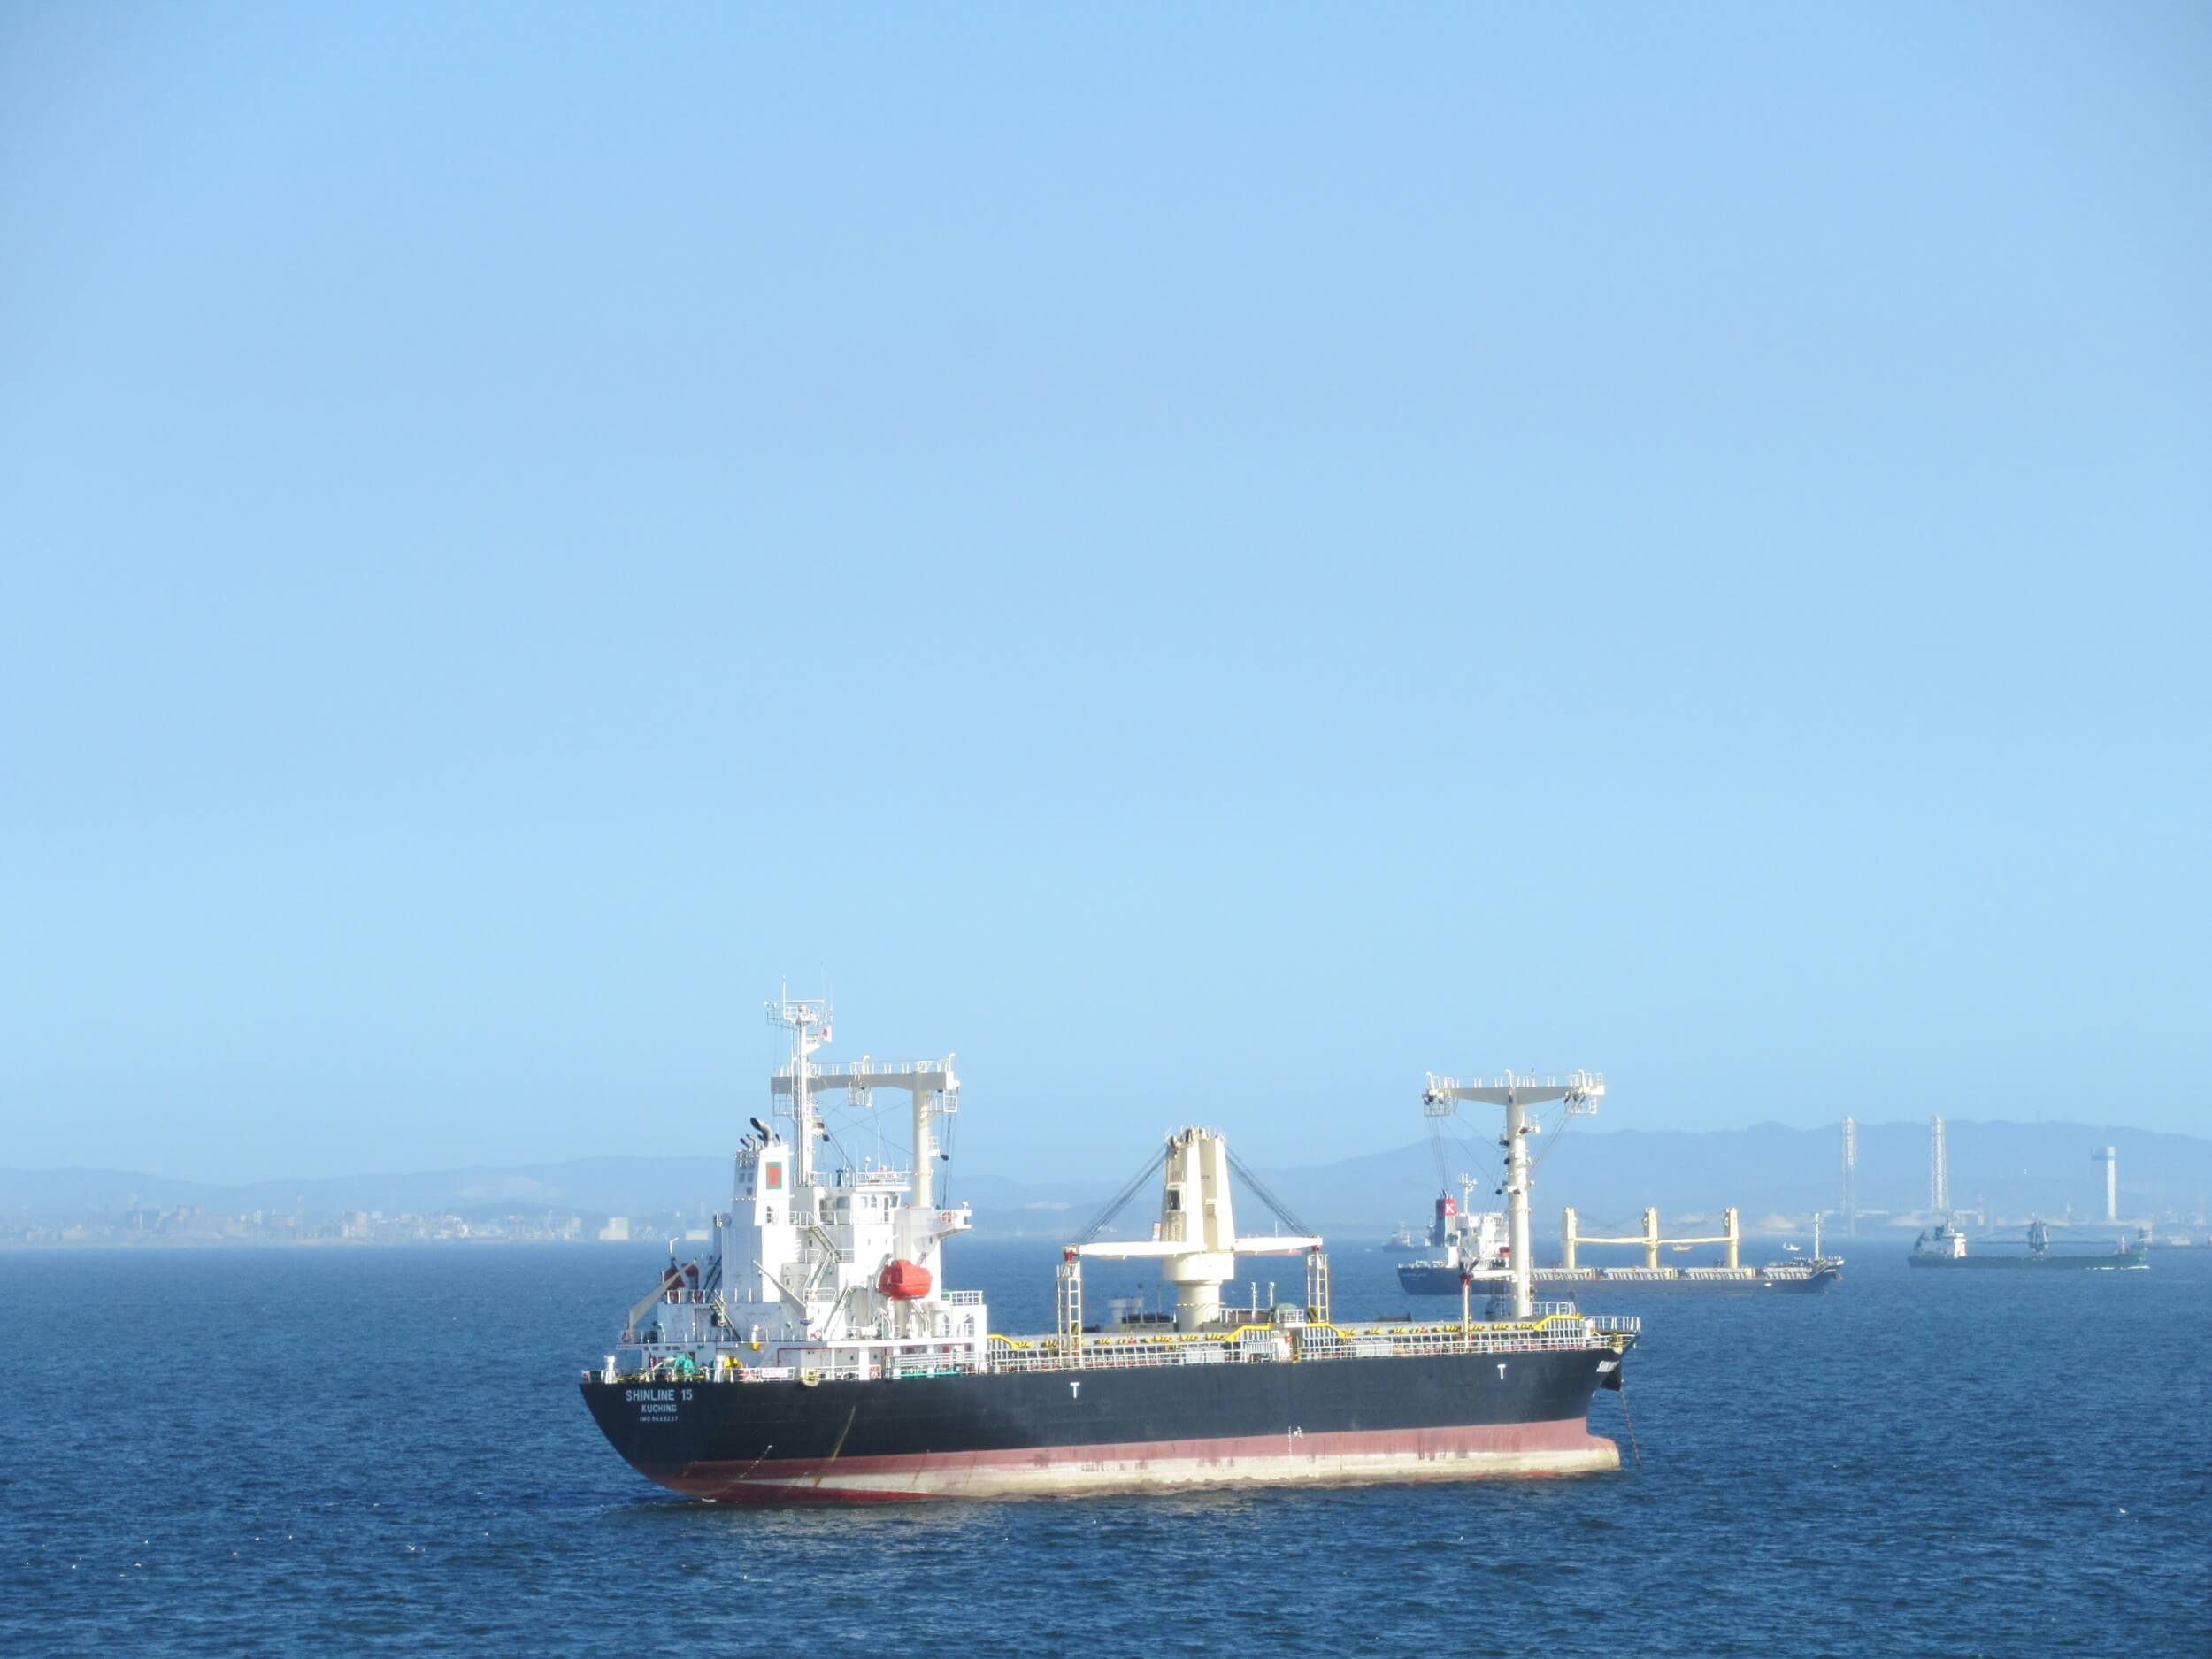 Yokohama Port Symbol Tower・Cargo ship and Boso Peninsula